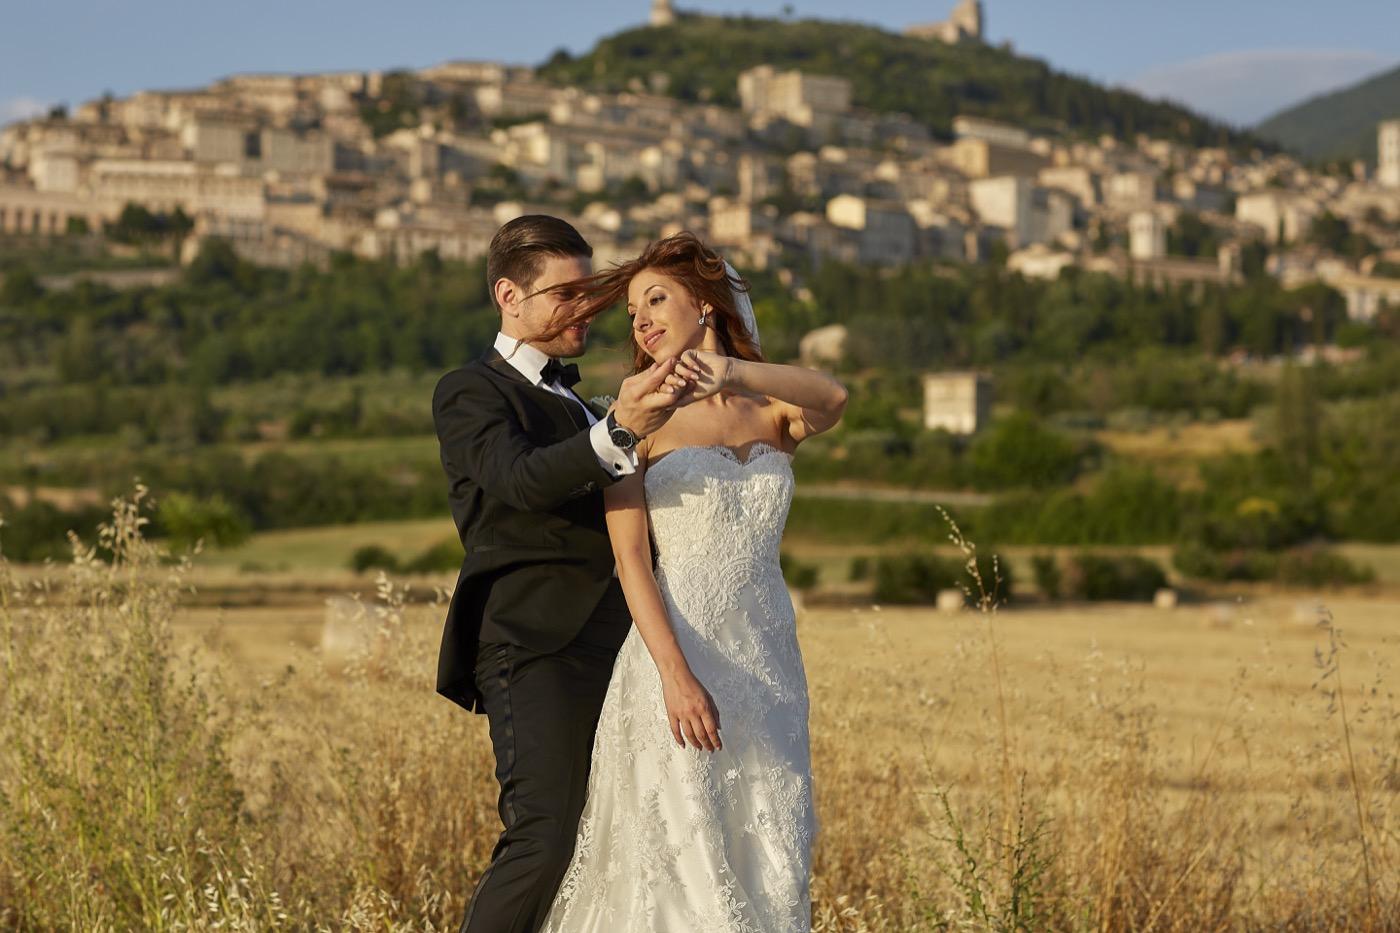 Claudio-Coppola-wedding-photographer-abbazia-7-frati-piegaro-67